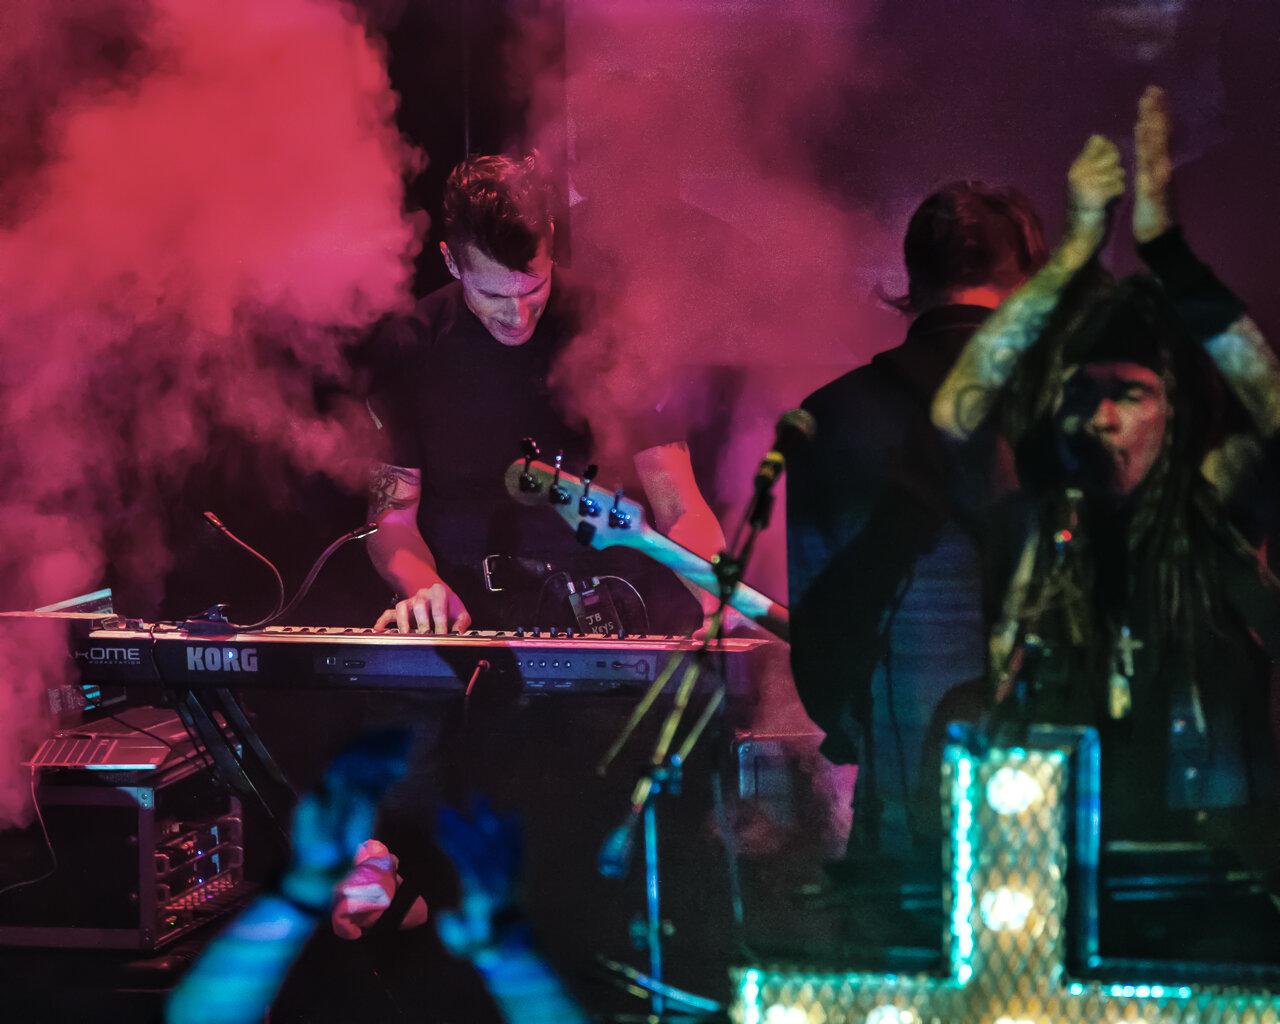 Ministry-VinylMusicHall-Pensacola-Nov012019-Raymer-019.jpg